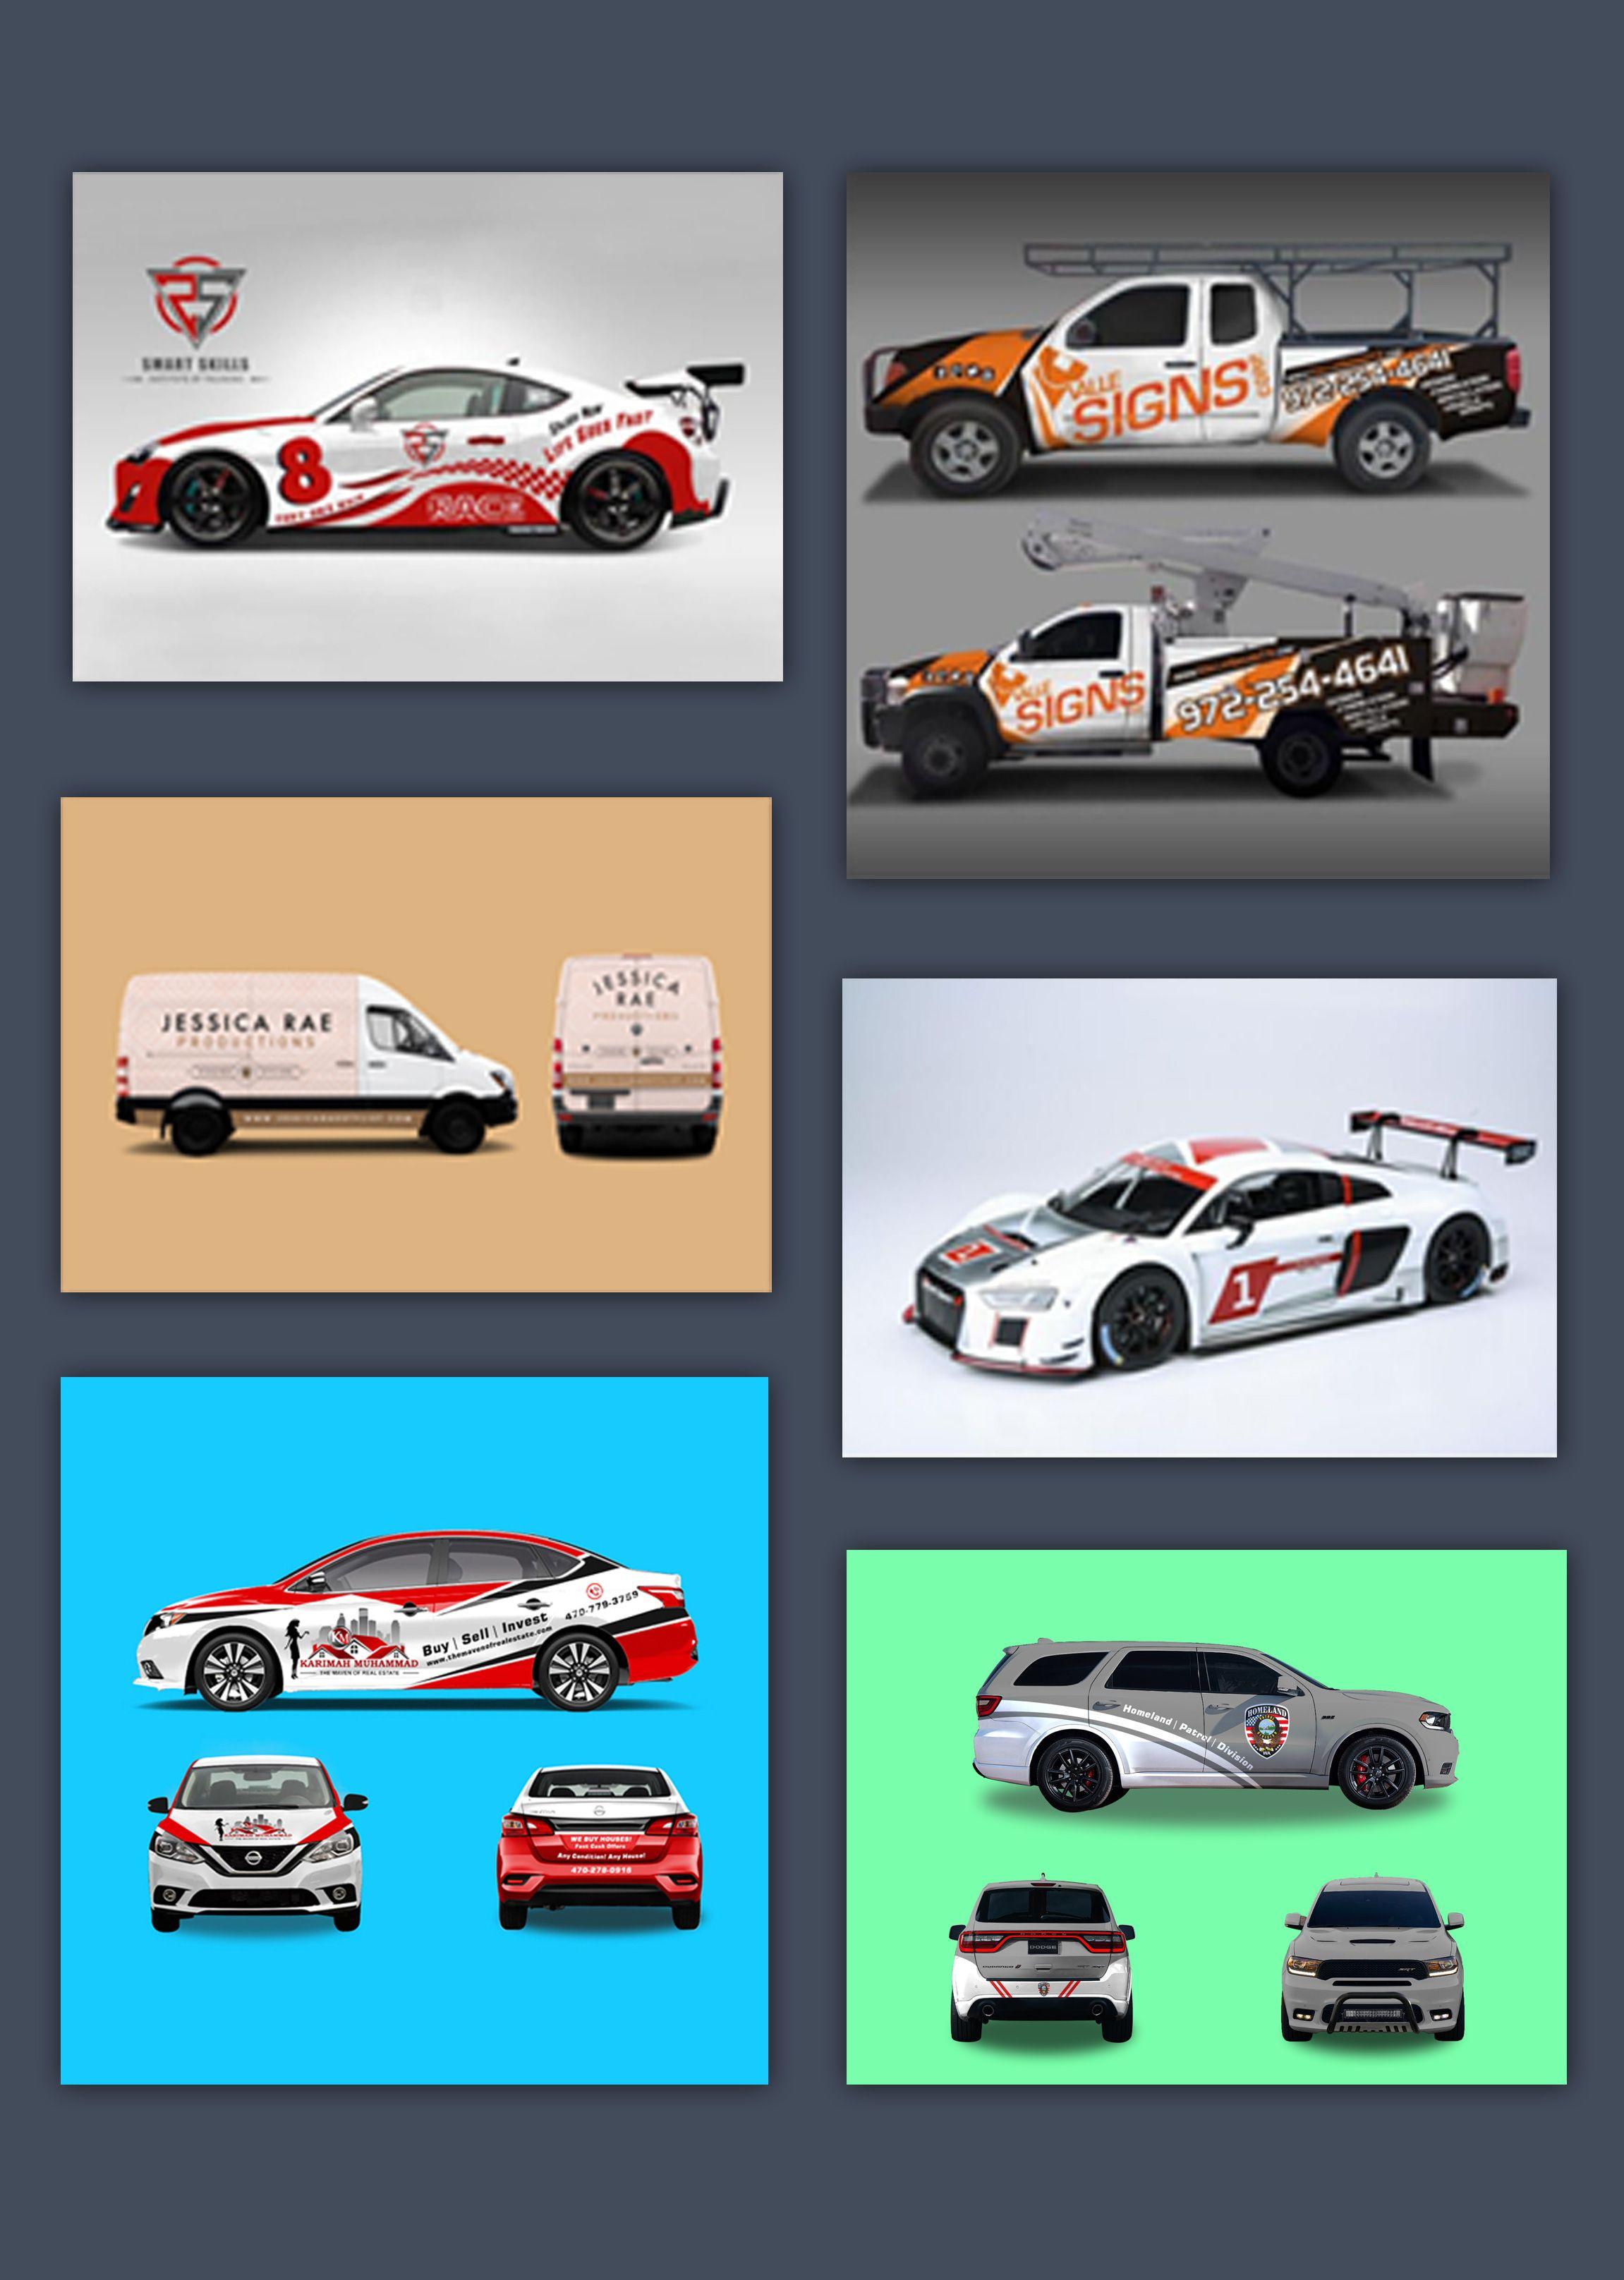 Graphic Design Services Hire A Graphic Designer Today Fiverr In 2020 Car Wrap Design Car Wrap Vehicles